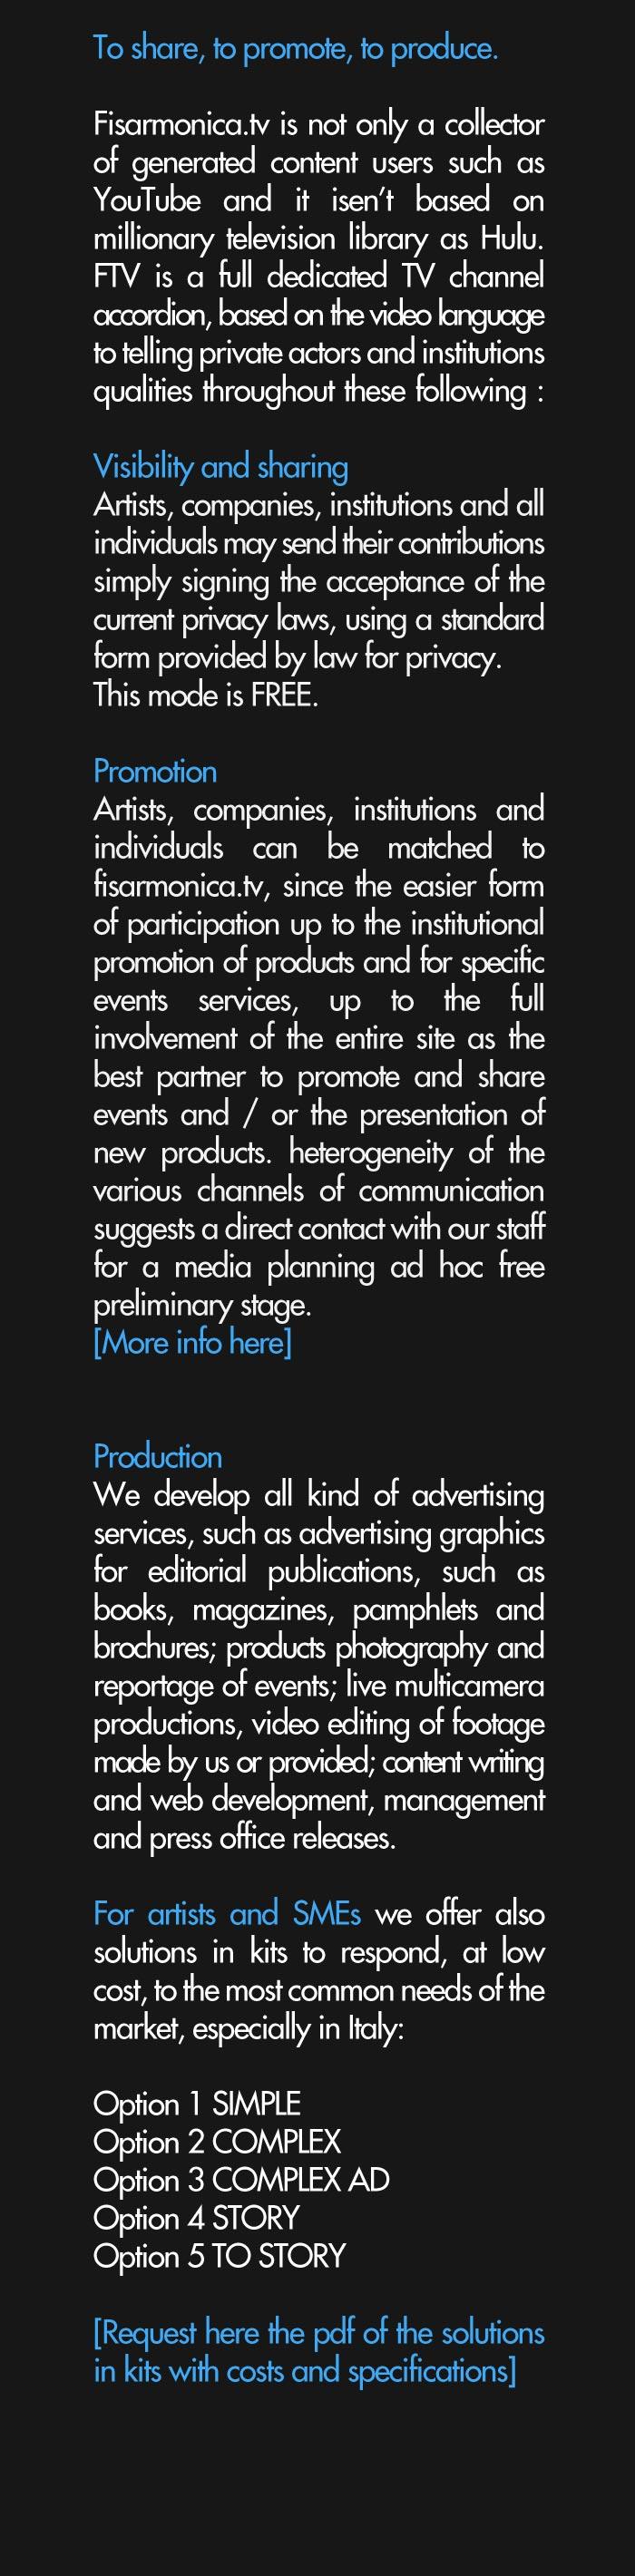 FTV-menu-2015-come-ENG